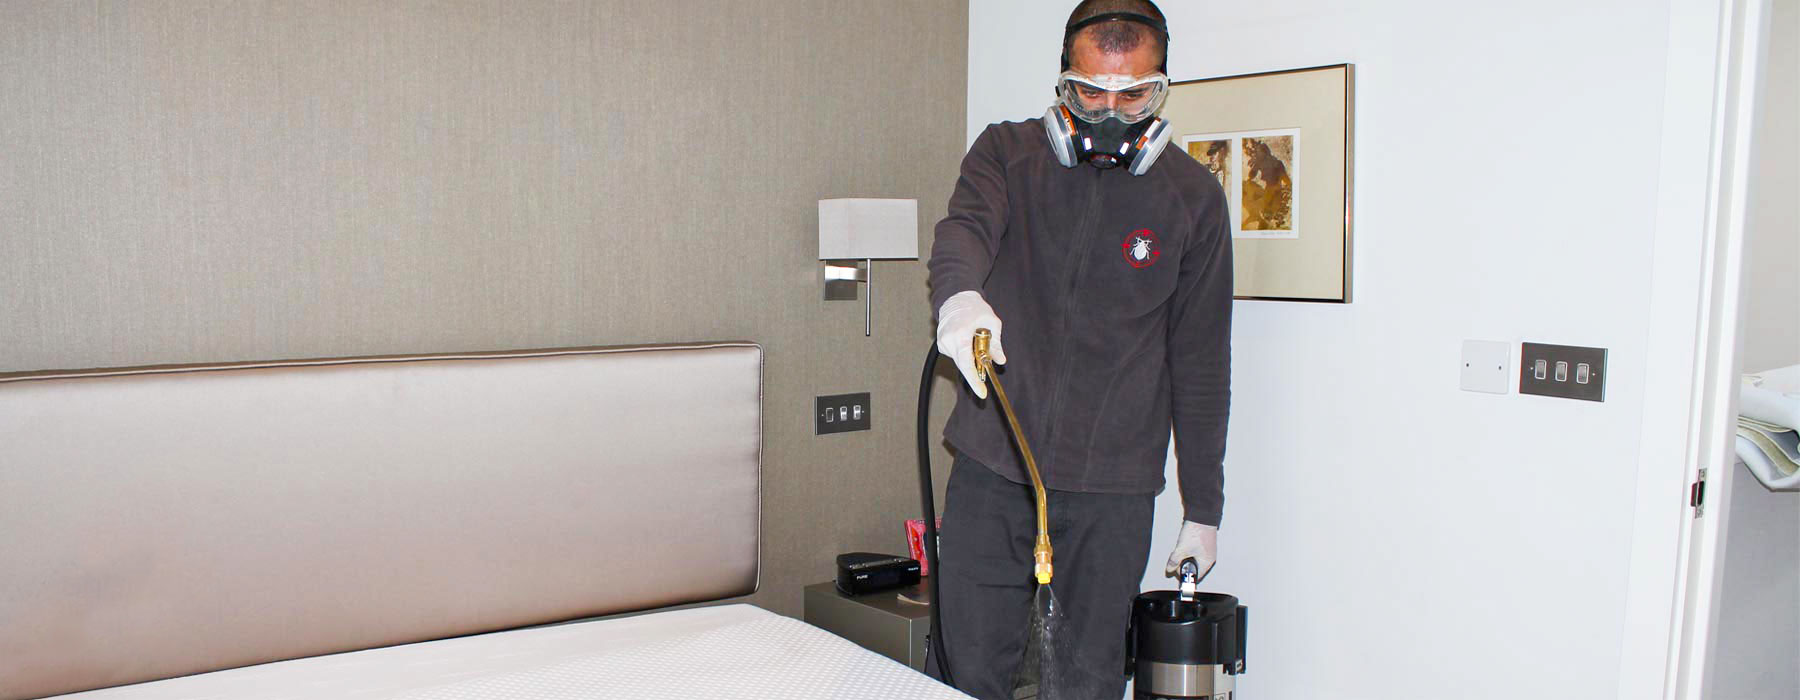 bed-bug-hotel-treatment-london